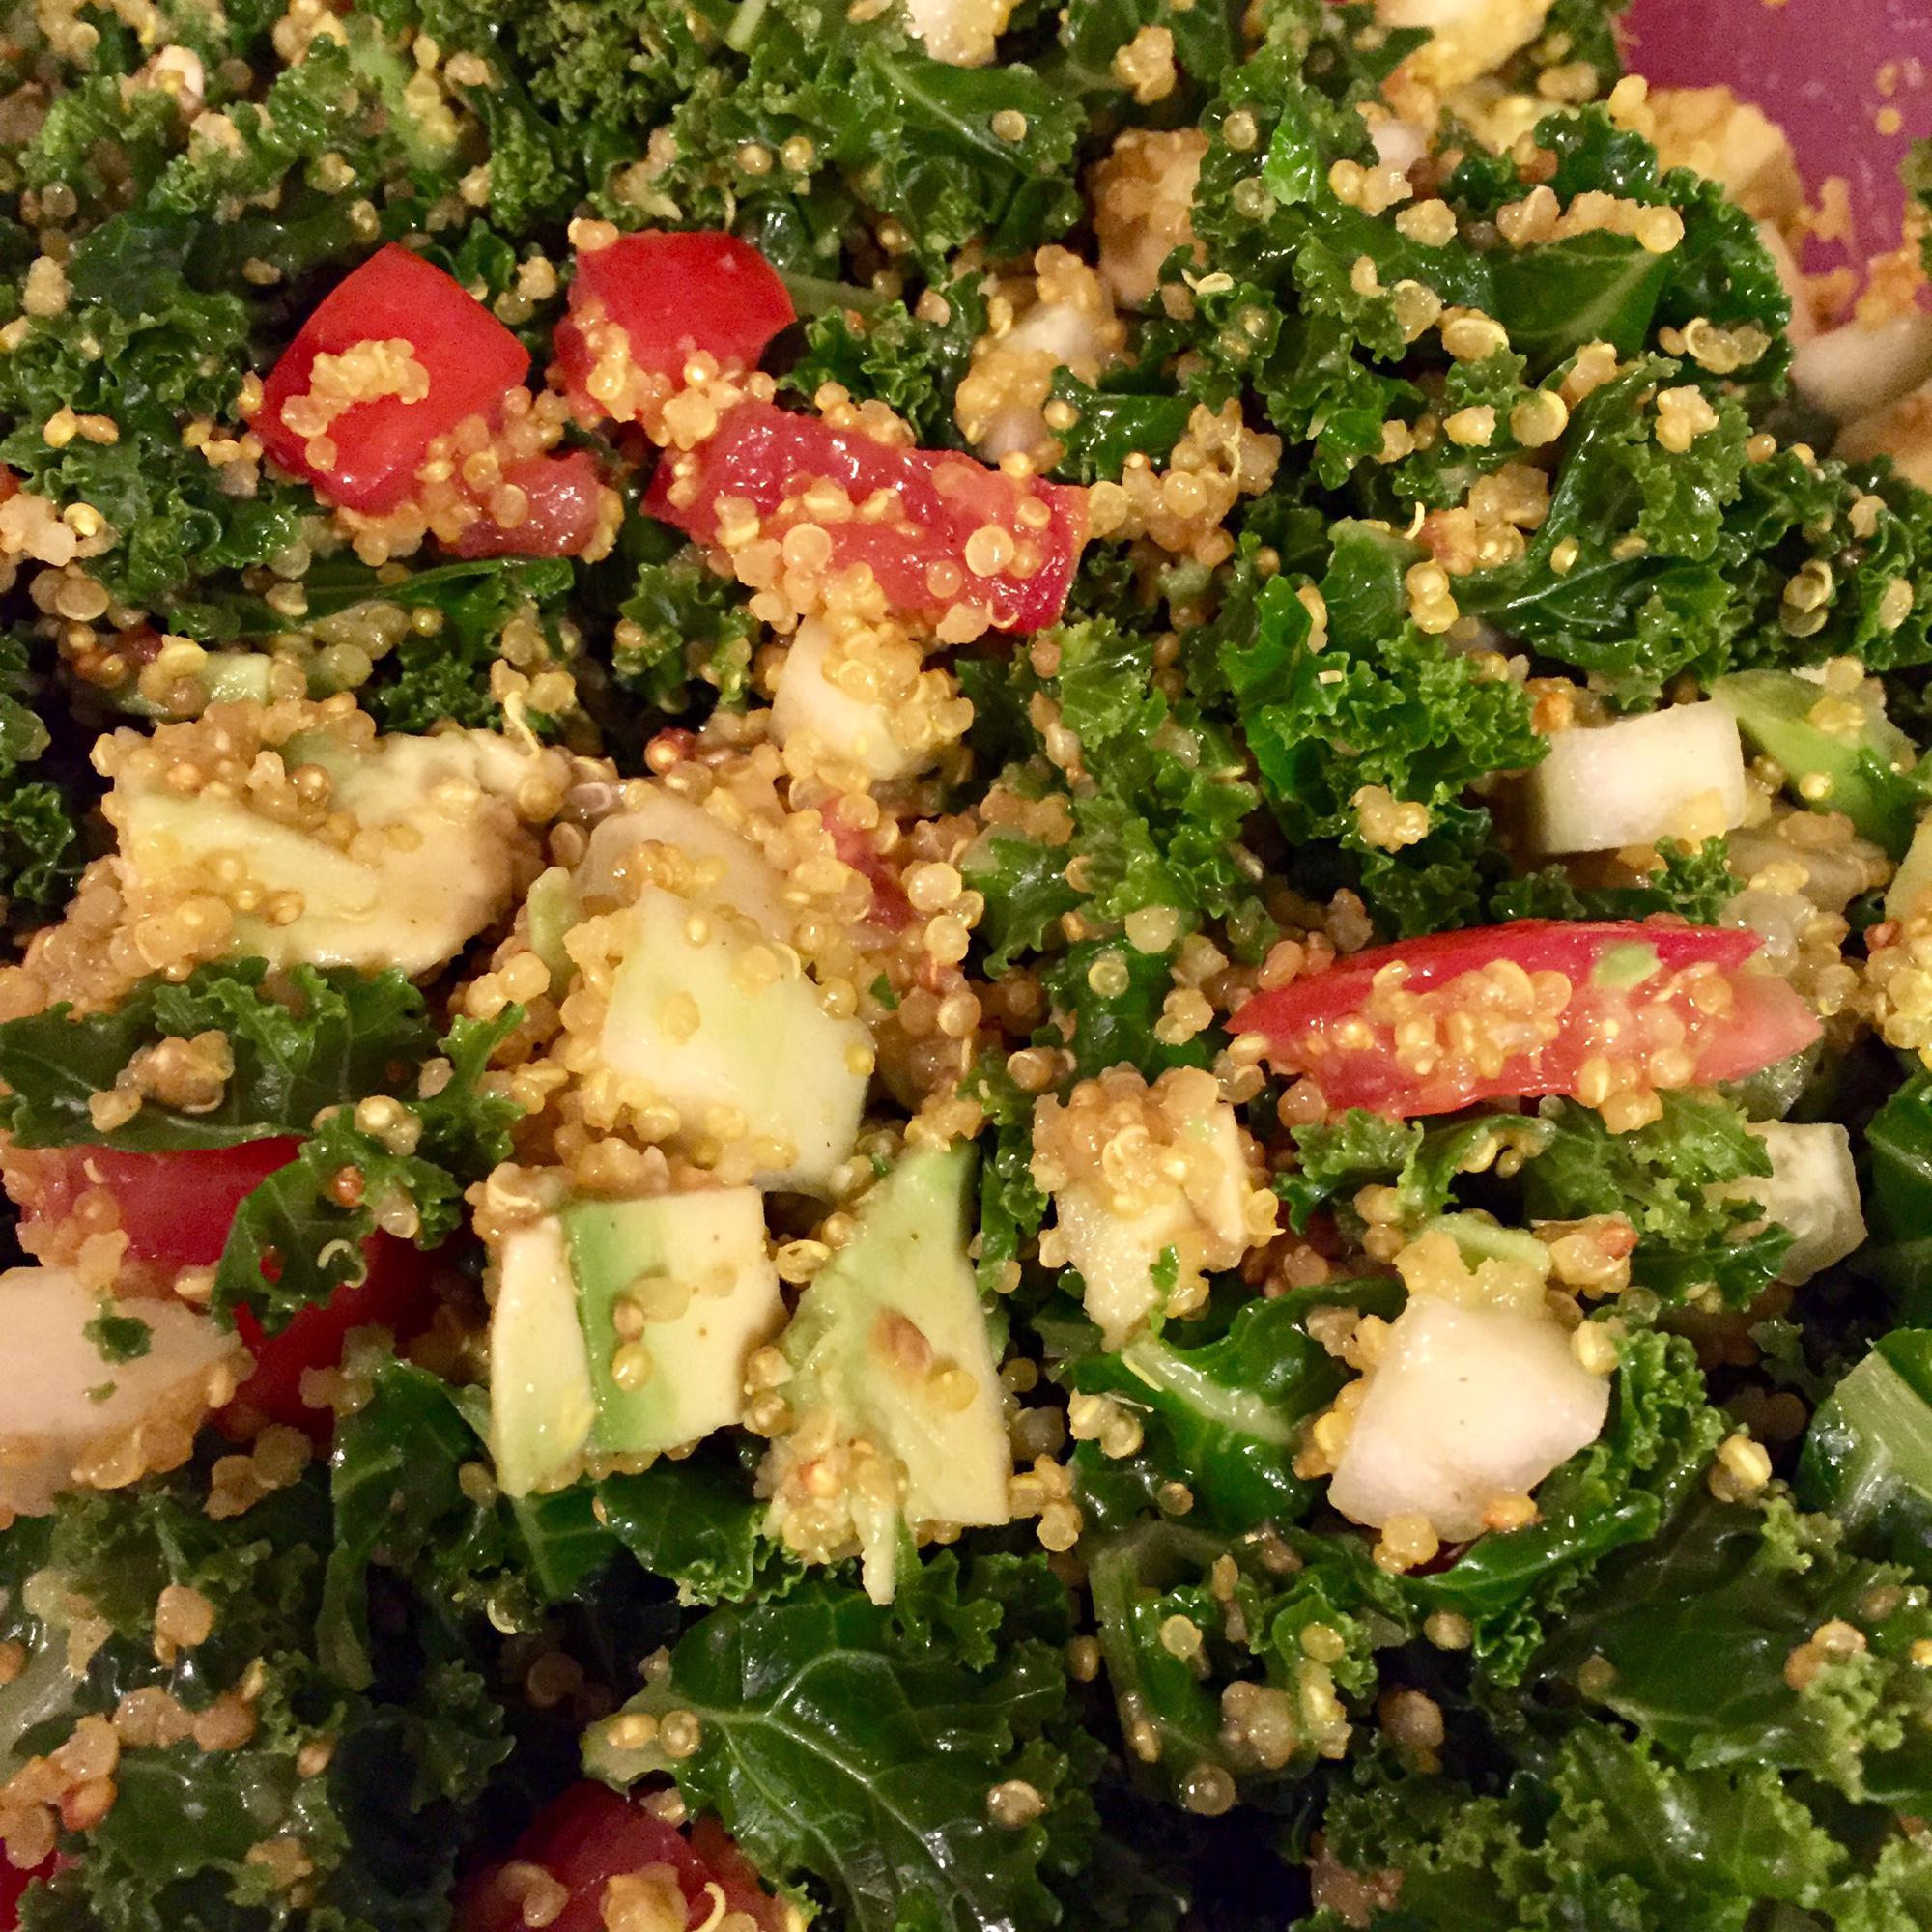 Kale Quinoa Salad cliffycliffycliff